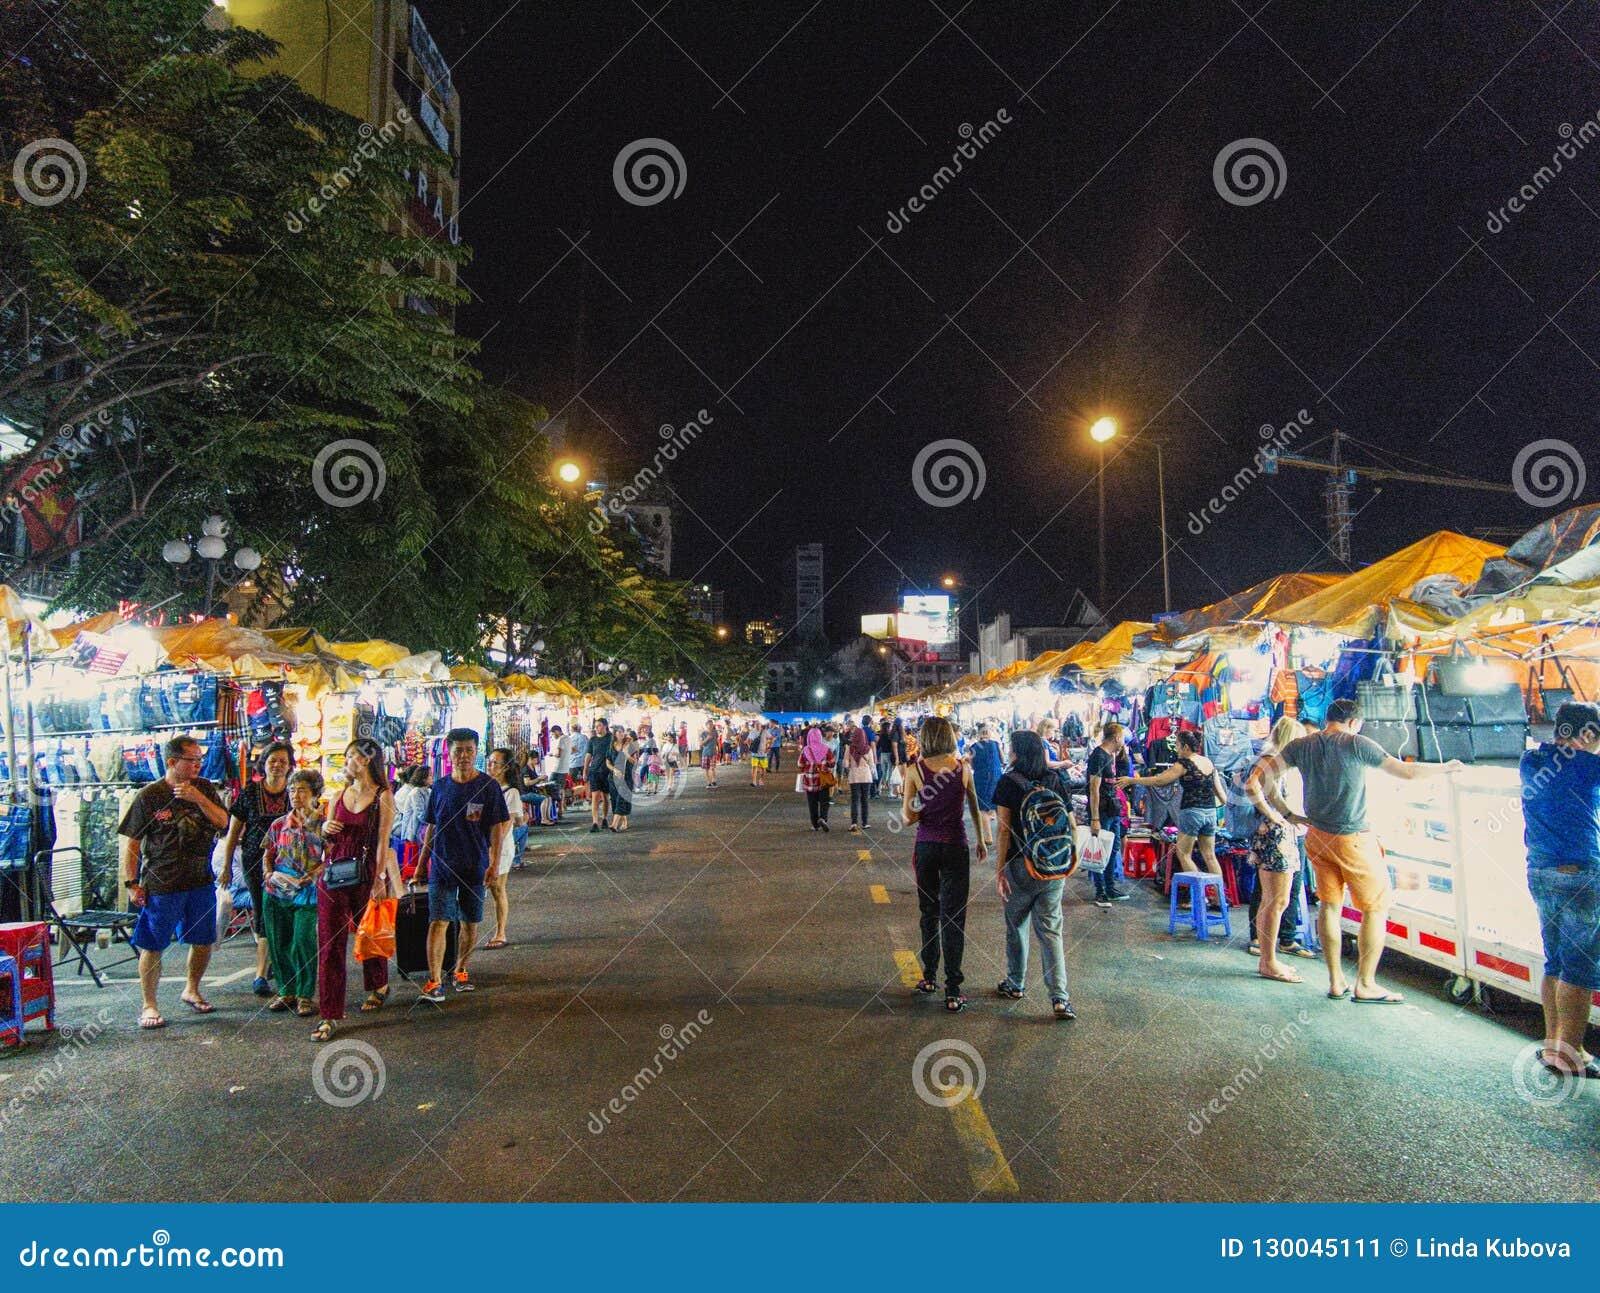 A night market in Ho Chi Minh City